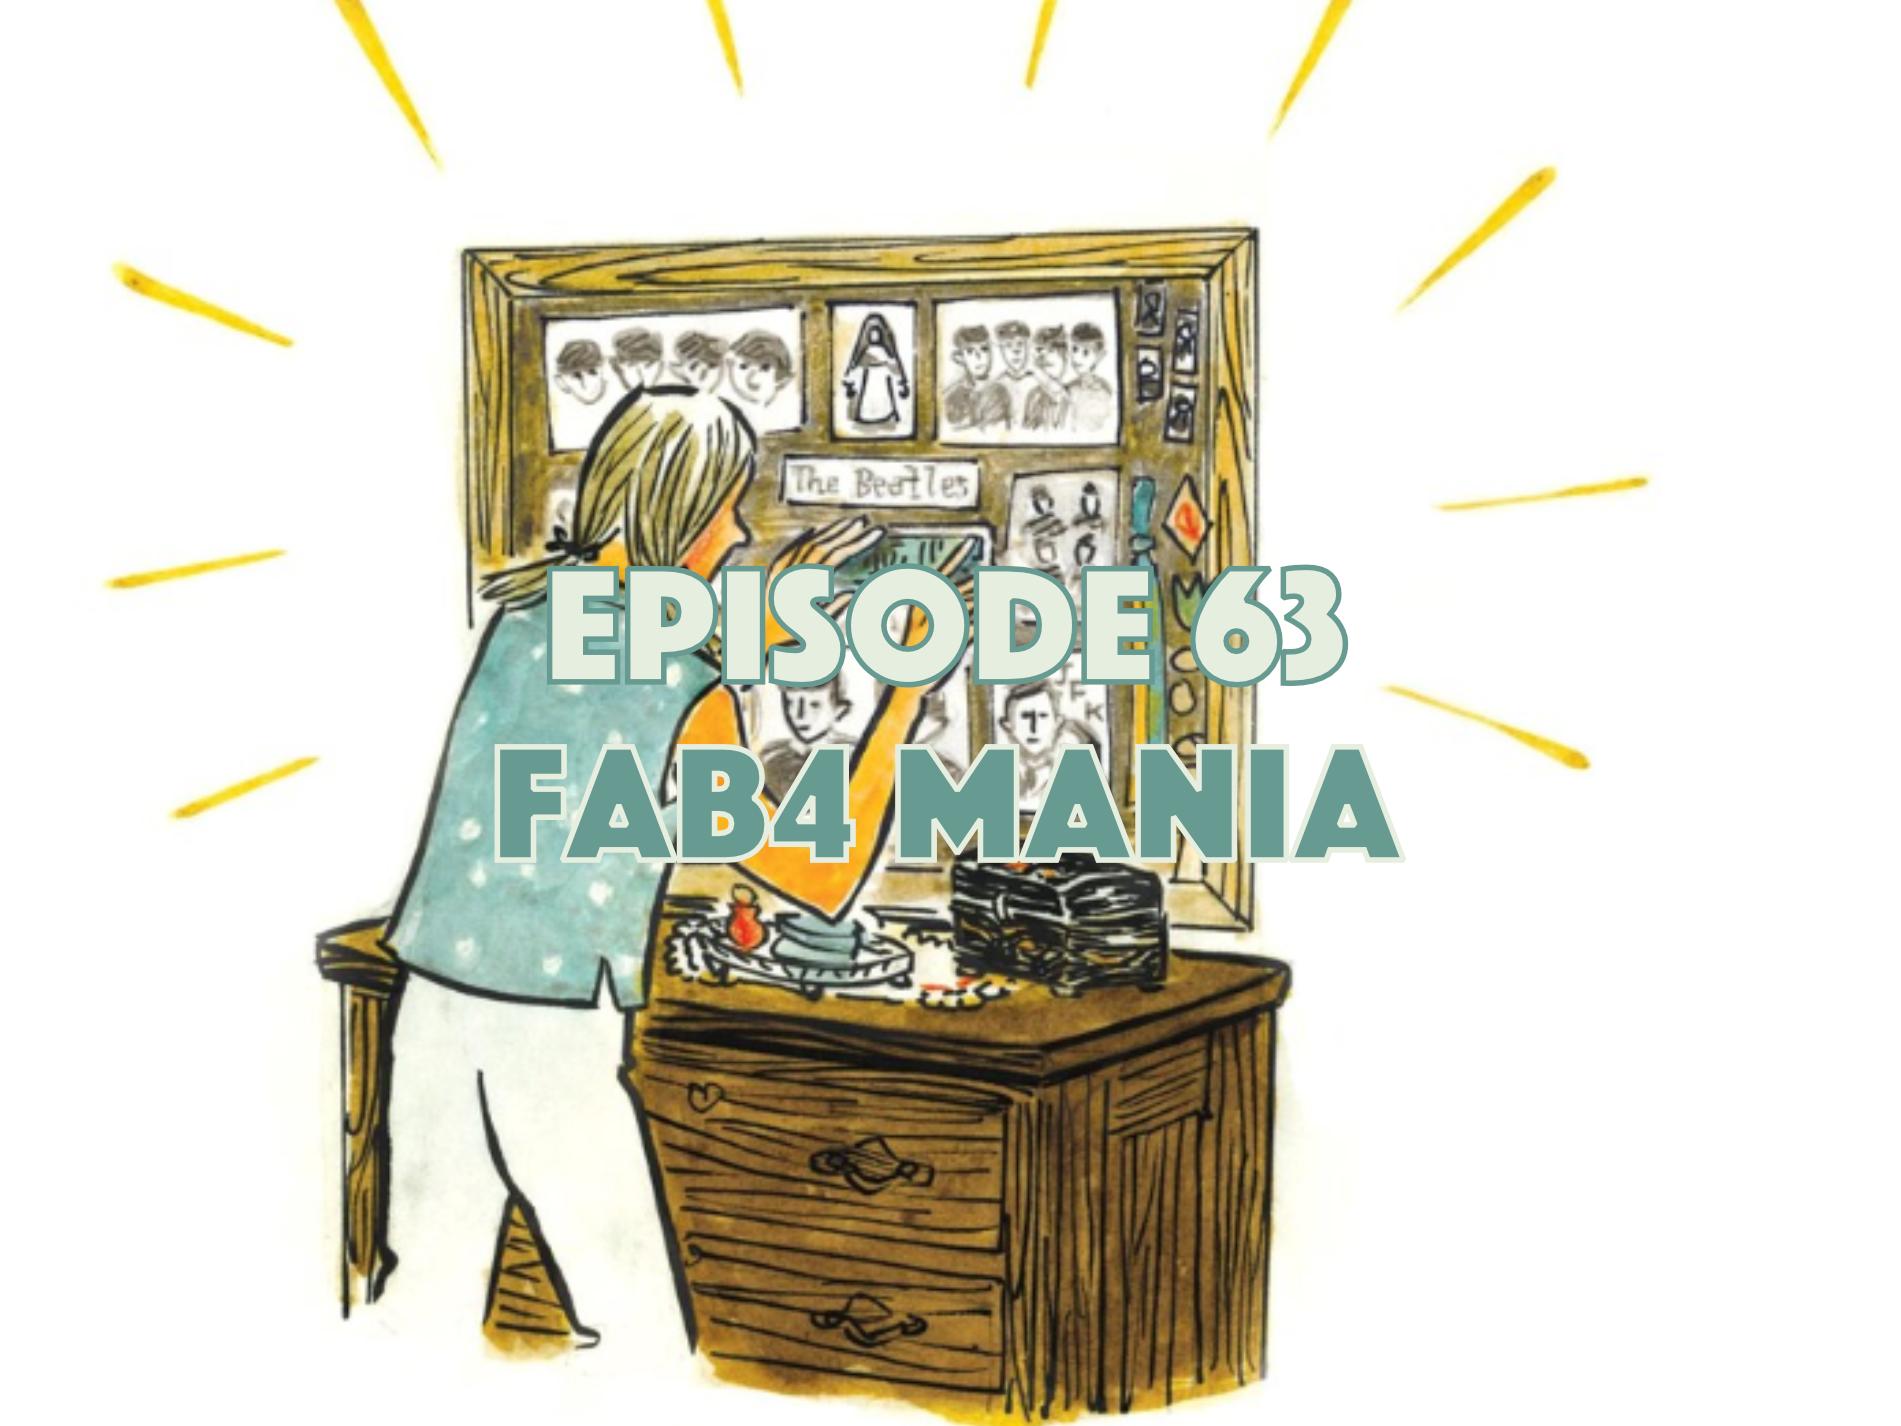 Graphic Novel, Comic Book, Graphic Novel Explorers Club, Comic Book Podcast, Graphic Novel Podcast, Fab4 Mania, The Beatles, Carol Tyler